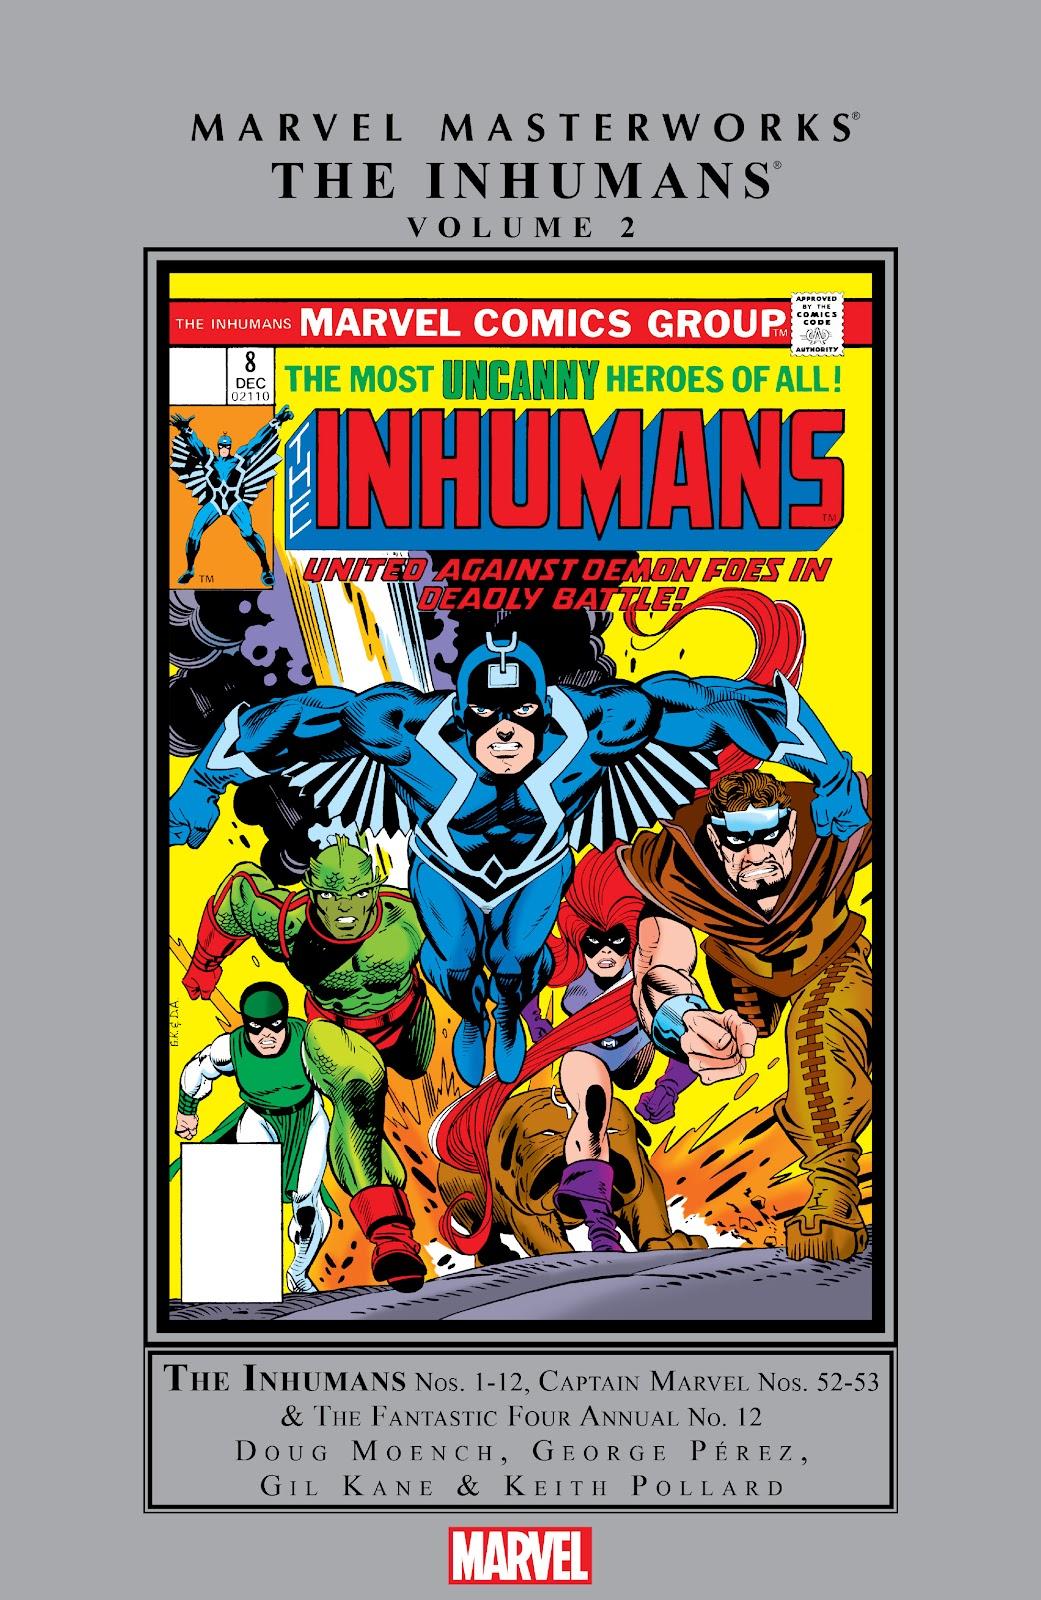 Read online Marvel Masterworks: The Inhumans comic -  Issue # TPB 2 (Part 1) - 1